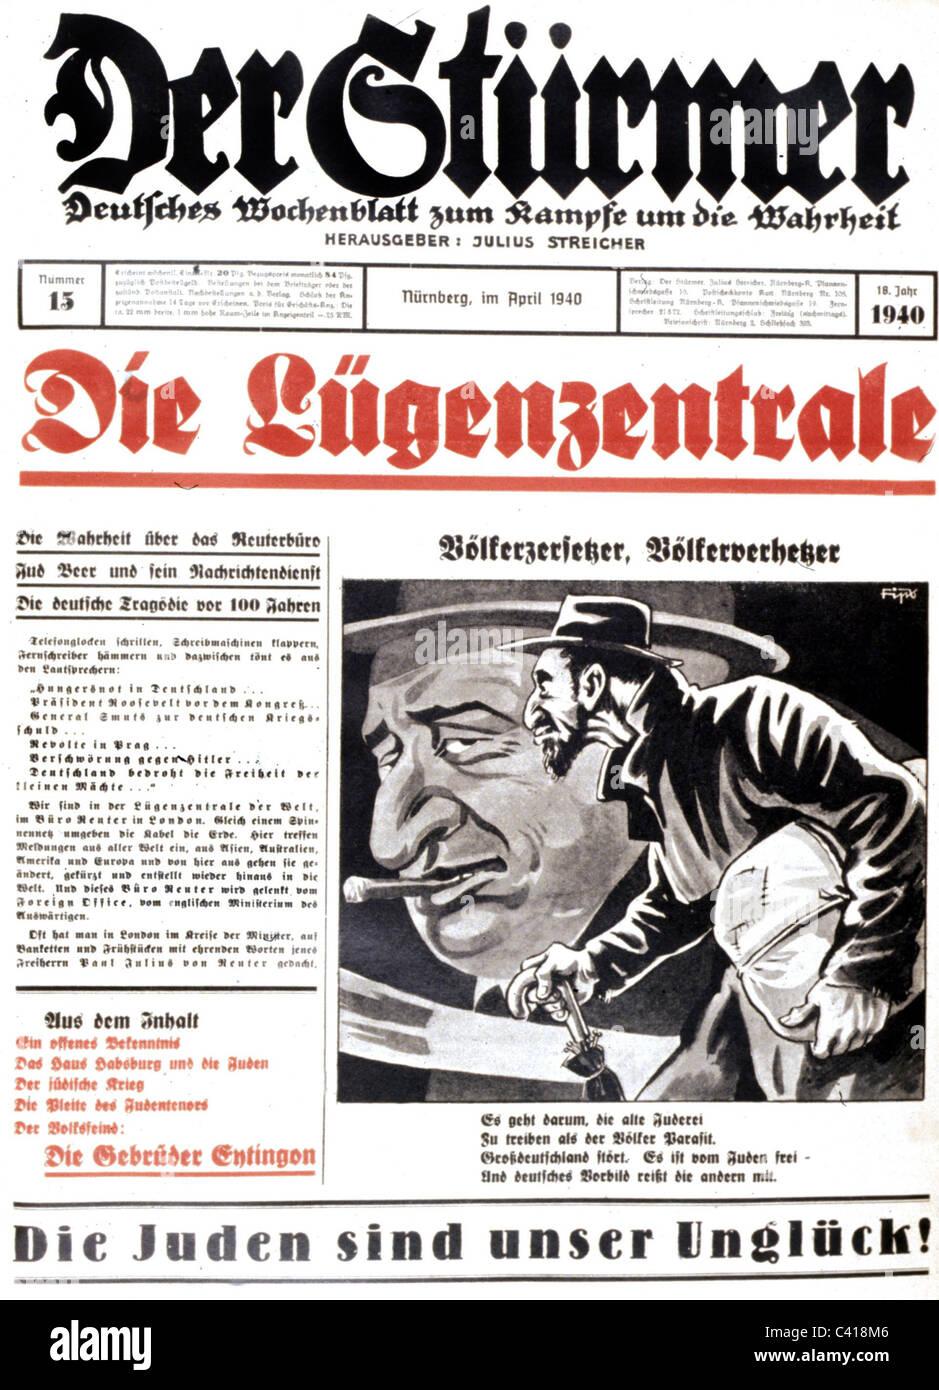 National Socialism / Nazism, anti-Semitic propaganda, press, 'Der Stuermer', No. 13, April 1940, front page, - Stock Image